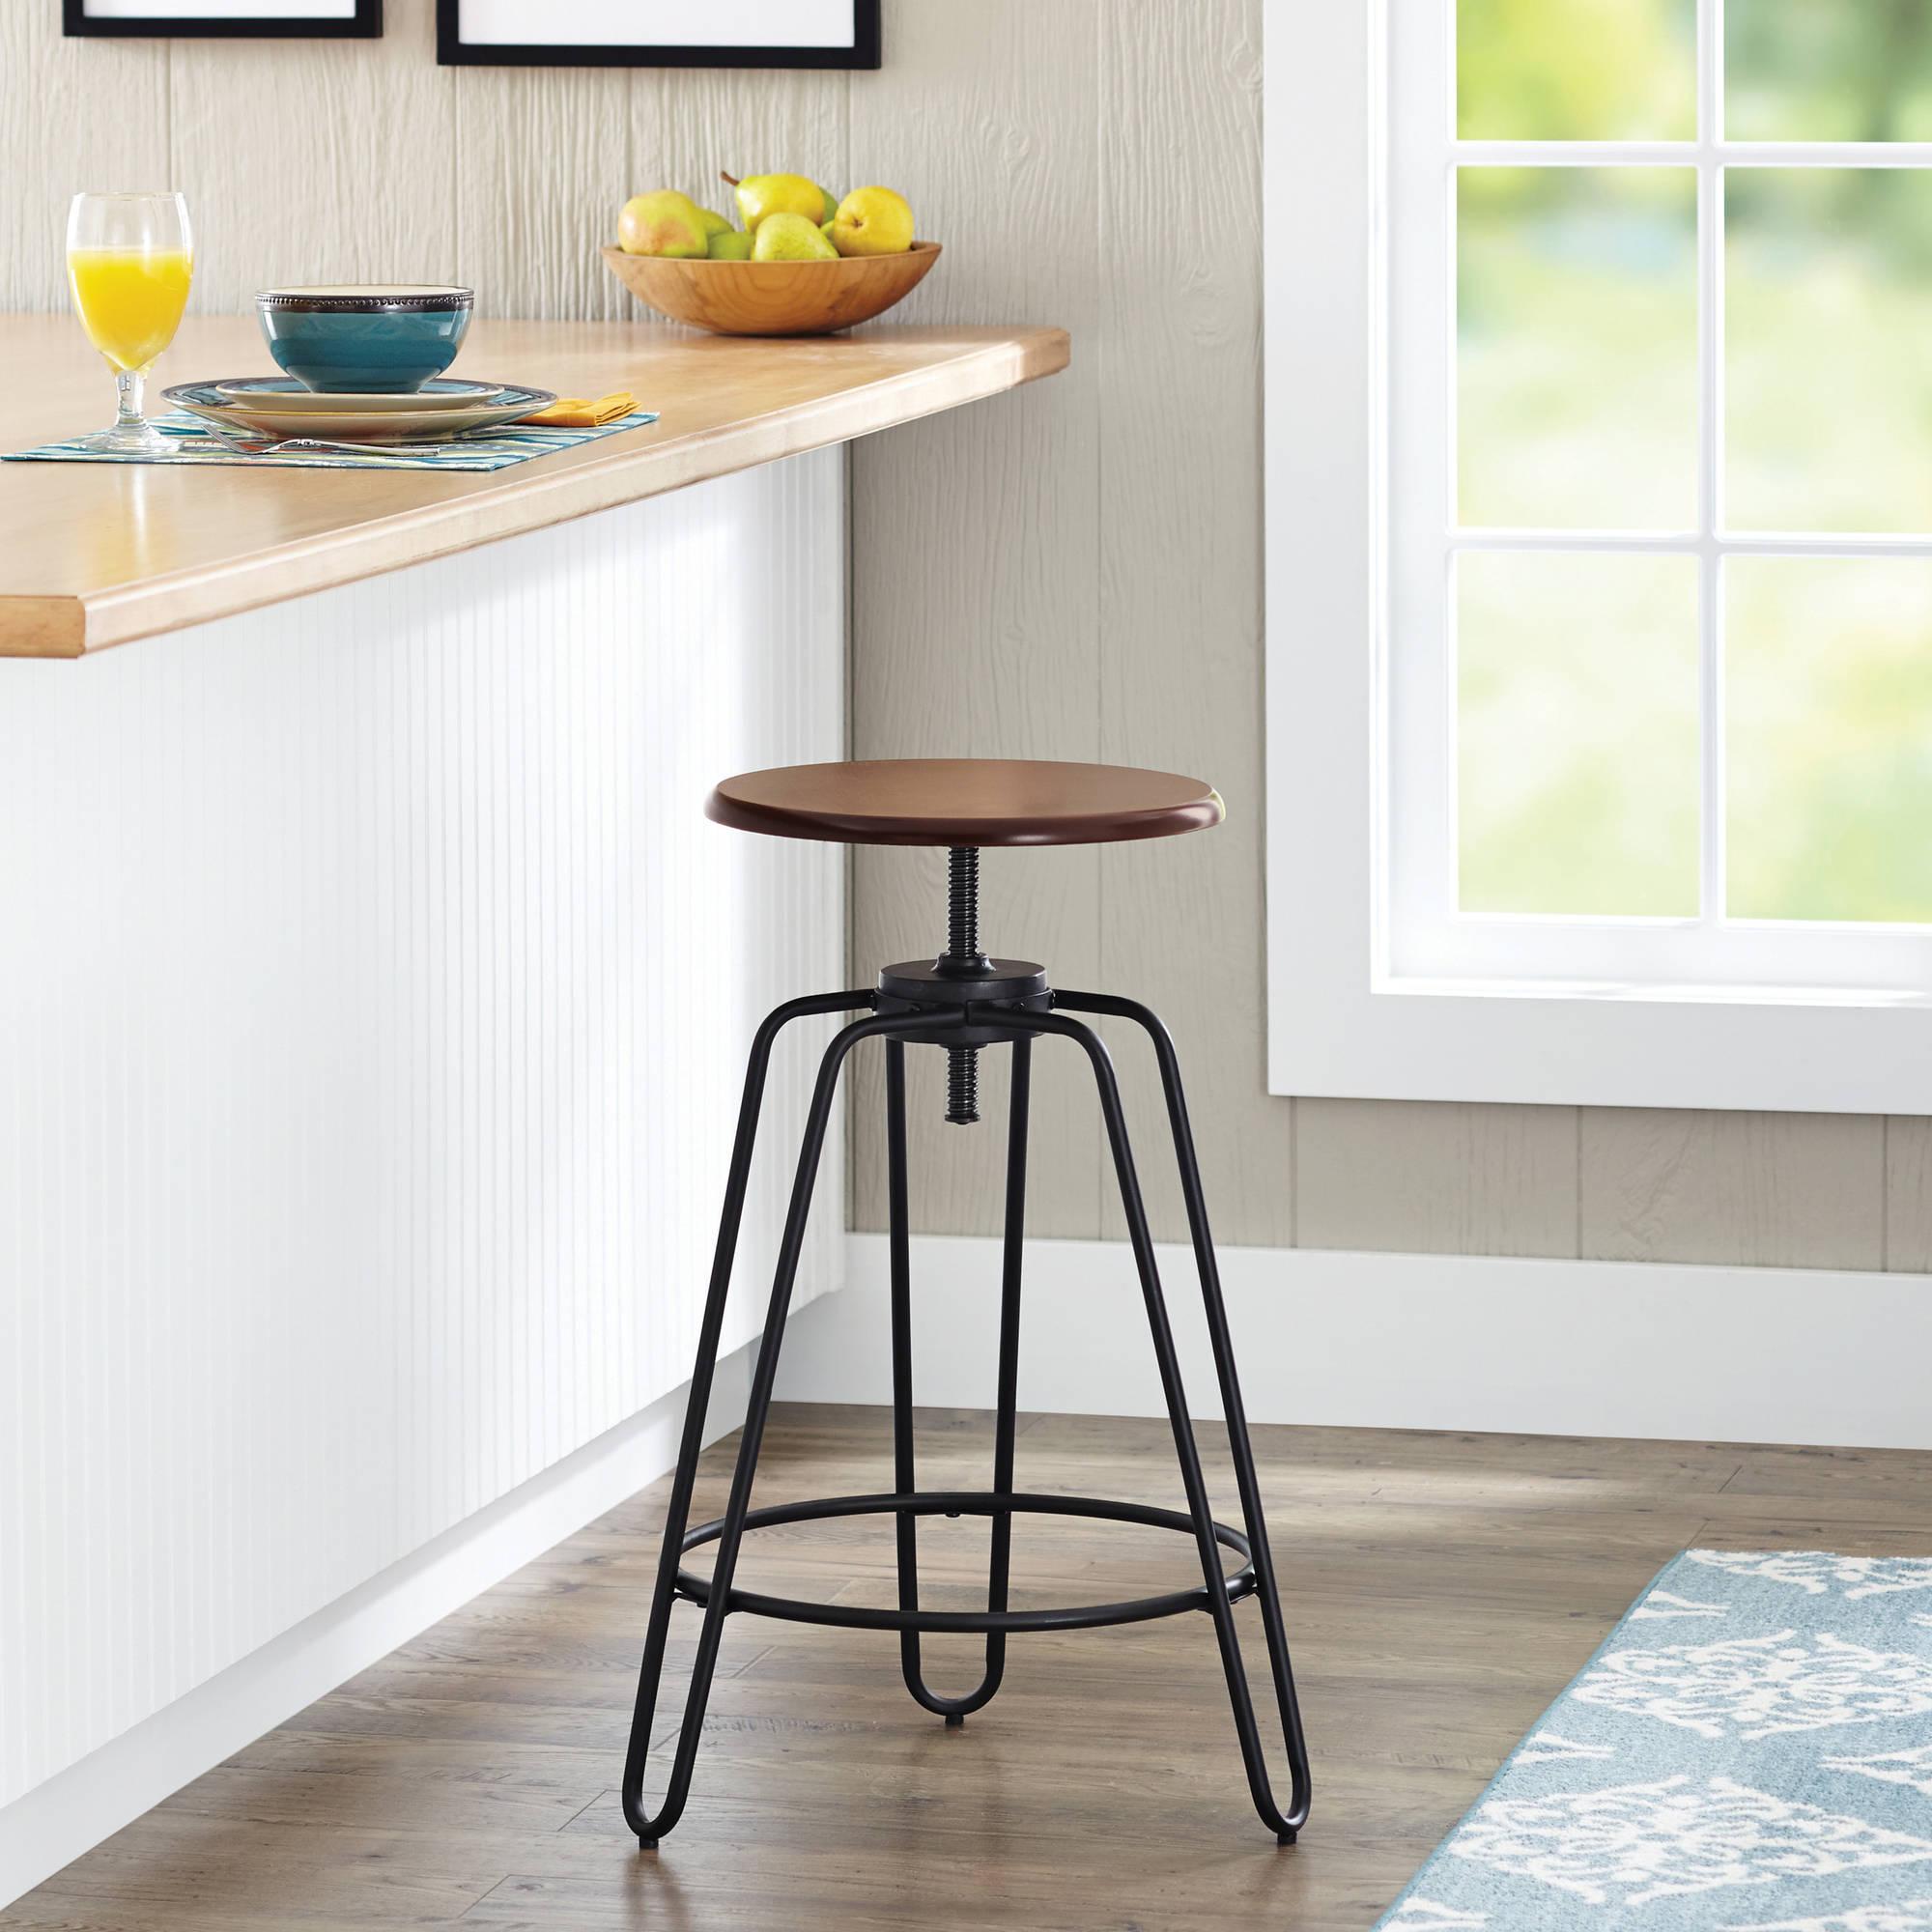 adjustable swivel bar stool with backrests height-adjustable swivel bar stool, hammered bronze, set of 3 - HCMATNP